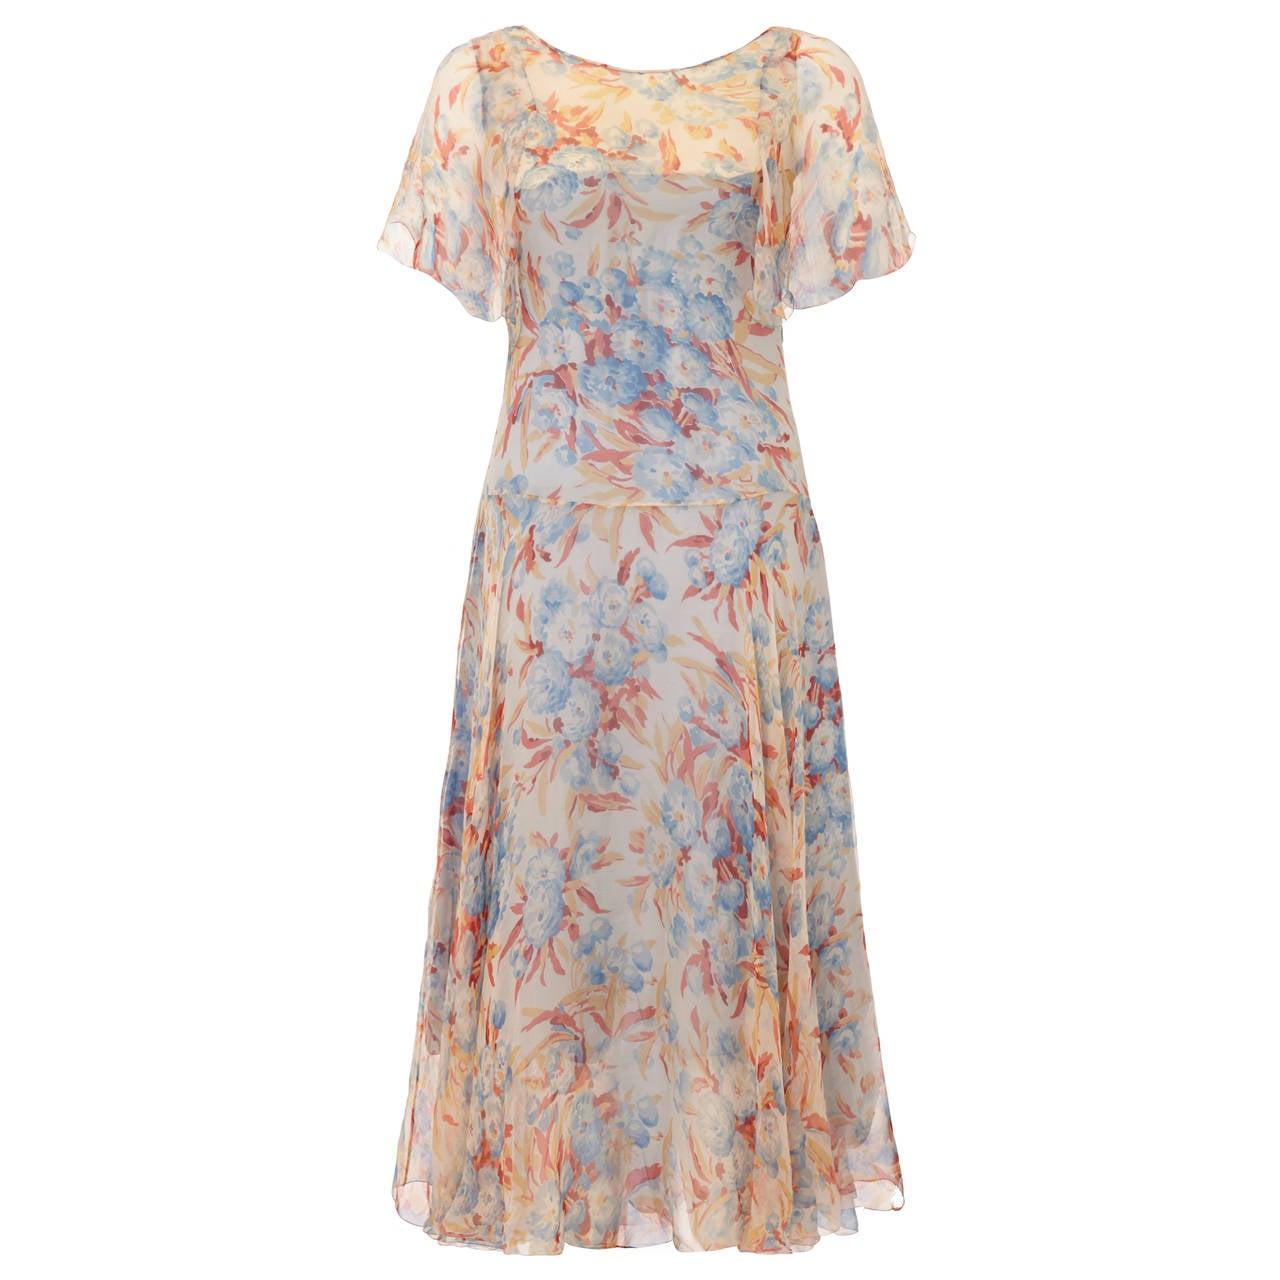 Outstanding 1920s Silk Chiffon Floral Dress 1